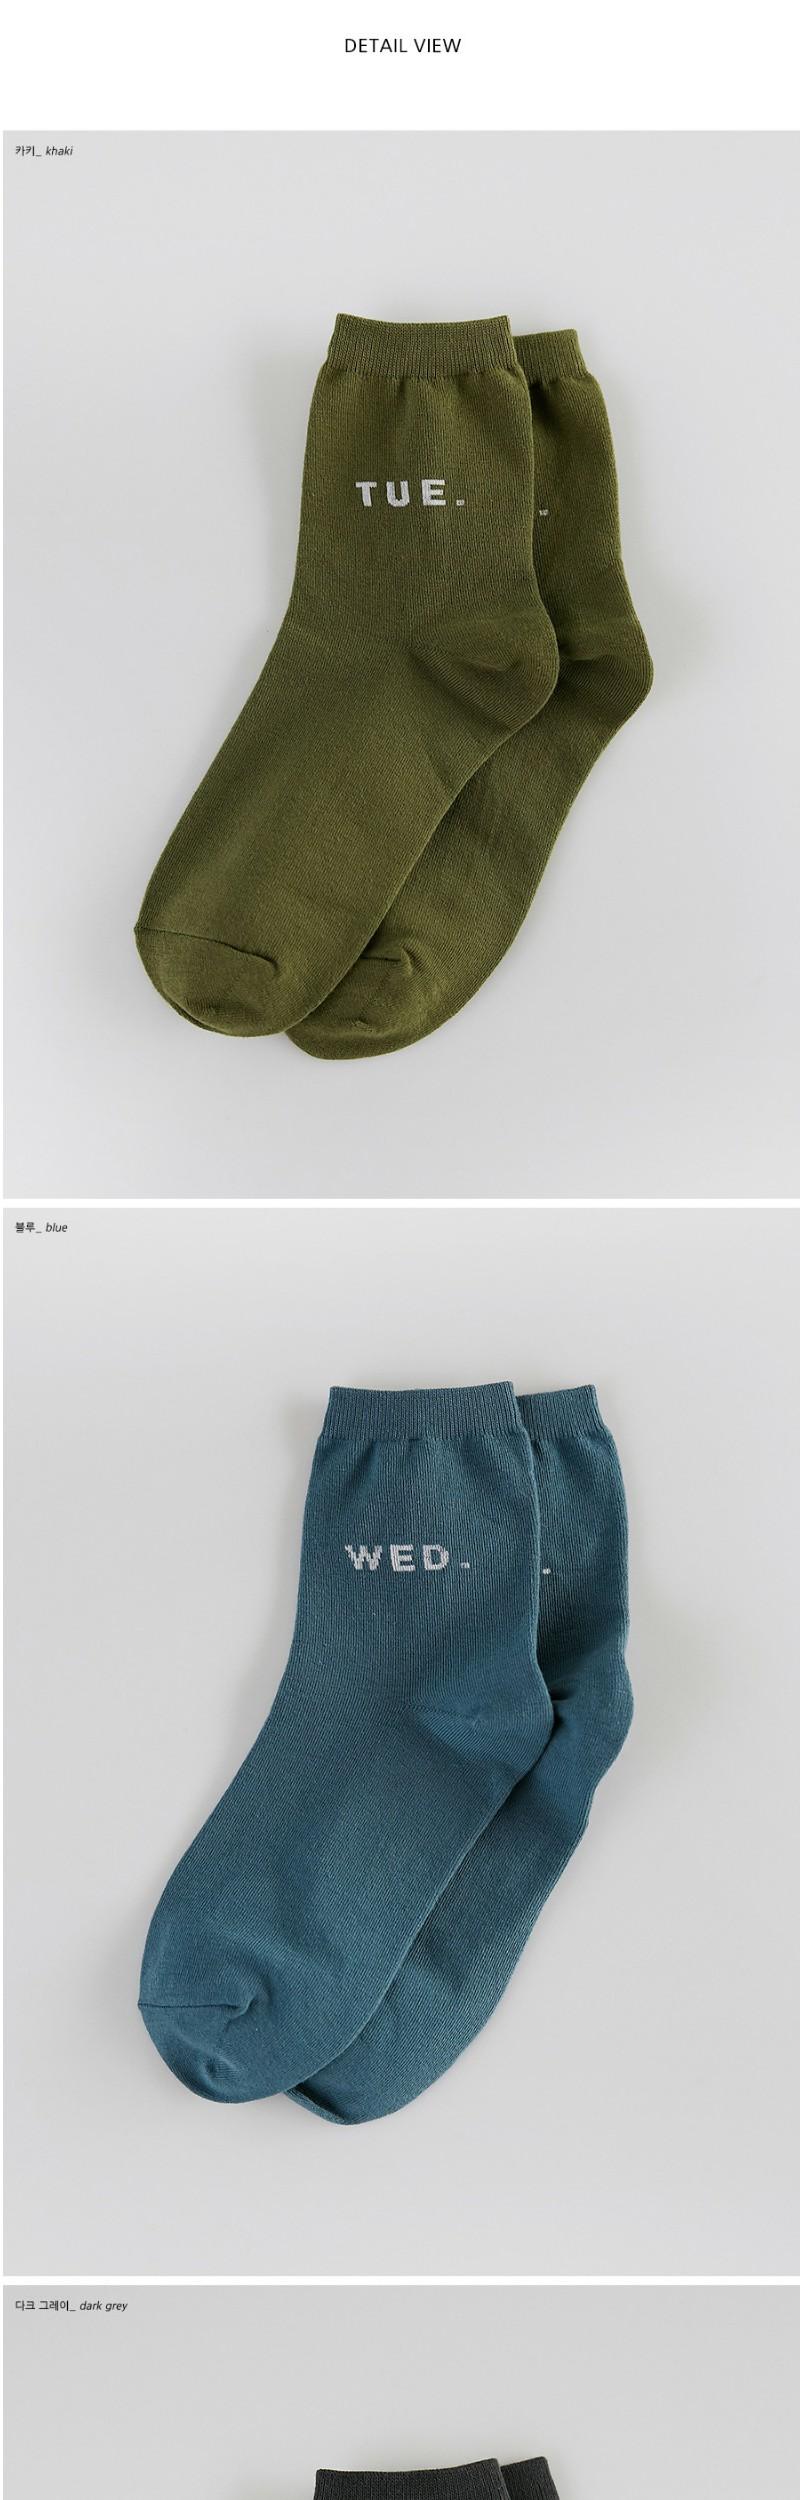 day of the week socks